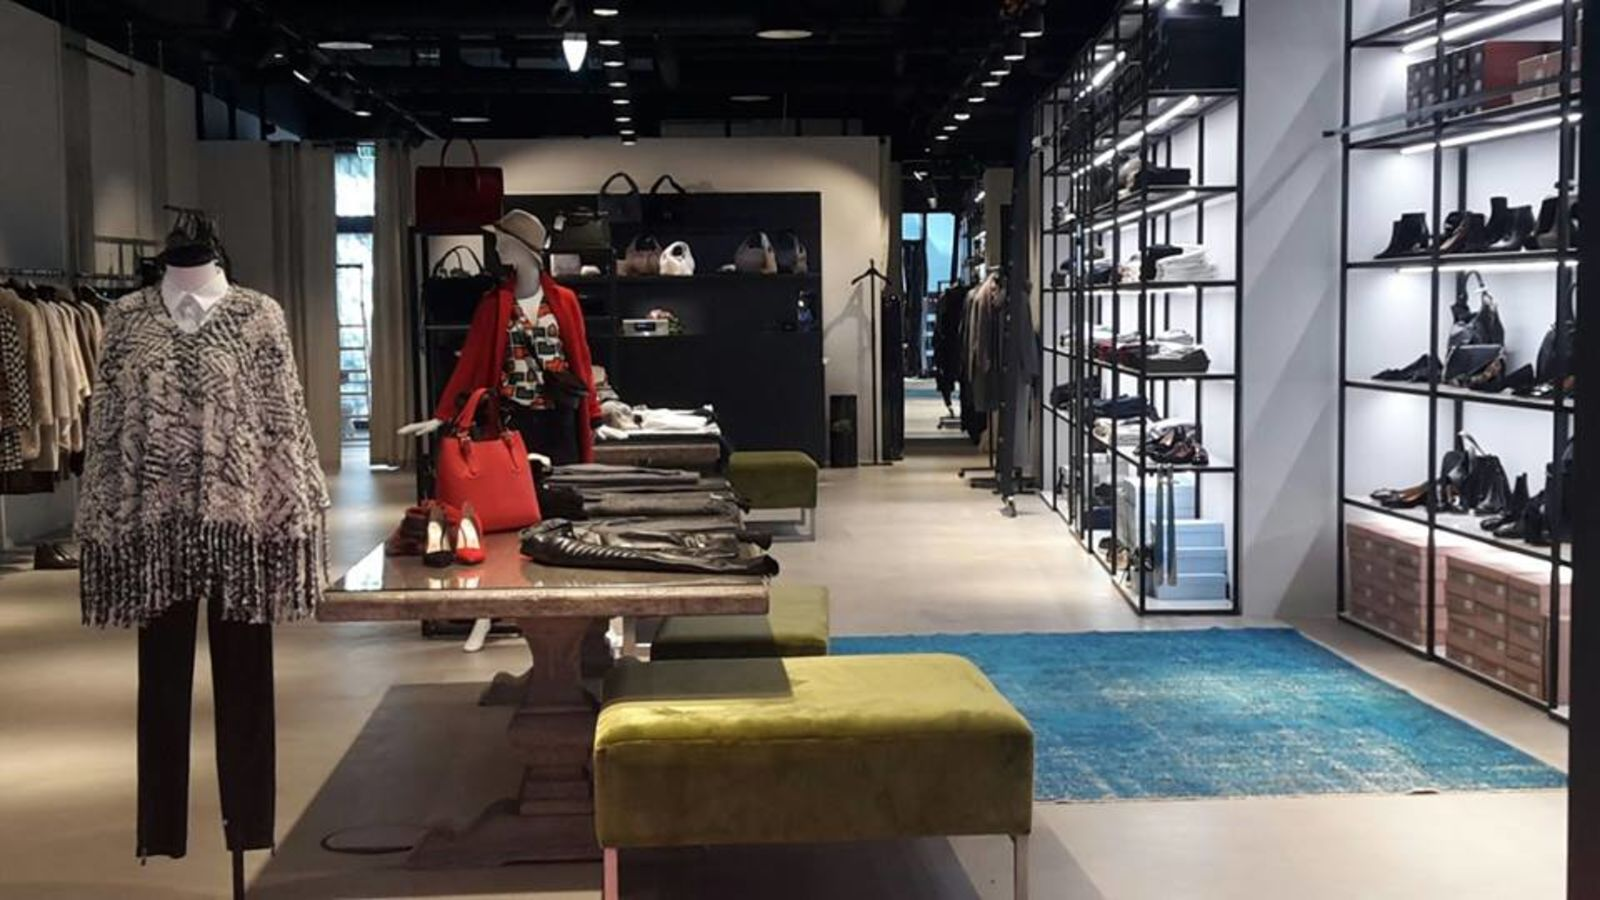 burresi loft damenmode in frankfurt am main neue mainzer stra e thelabelfinder. Black Bedroom Furniture Sets. Home Design Ideas